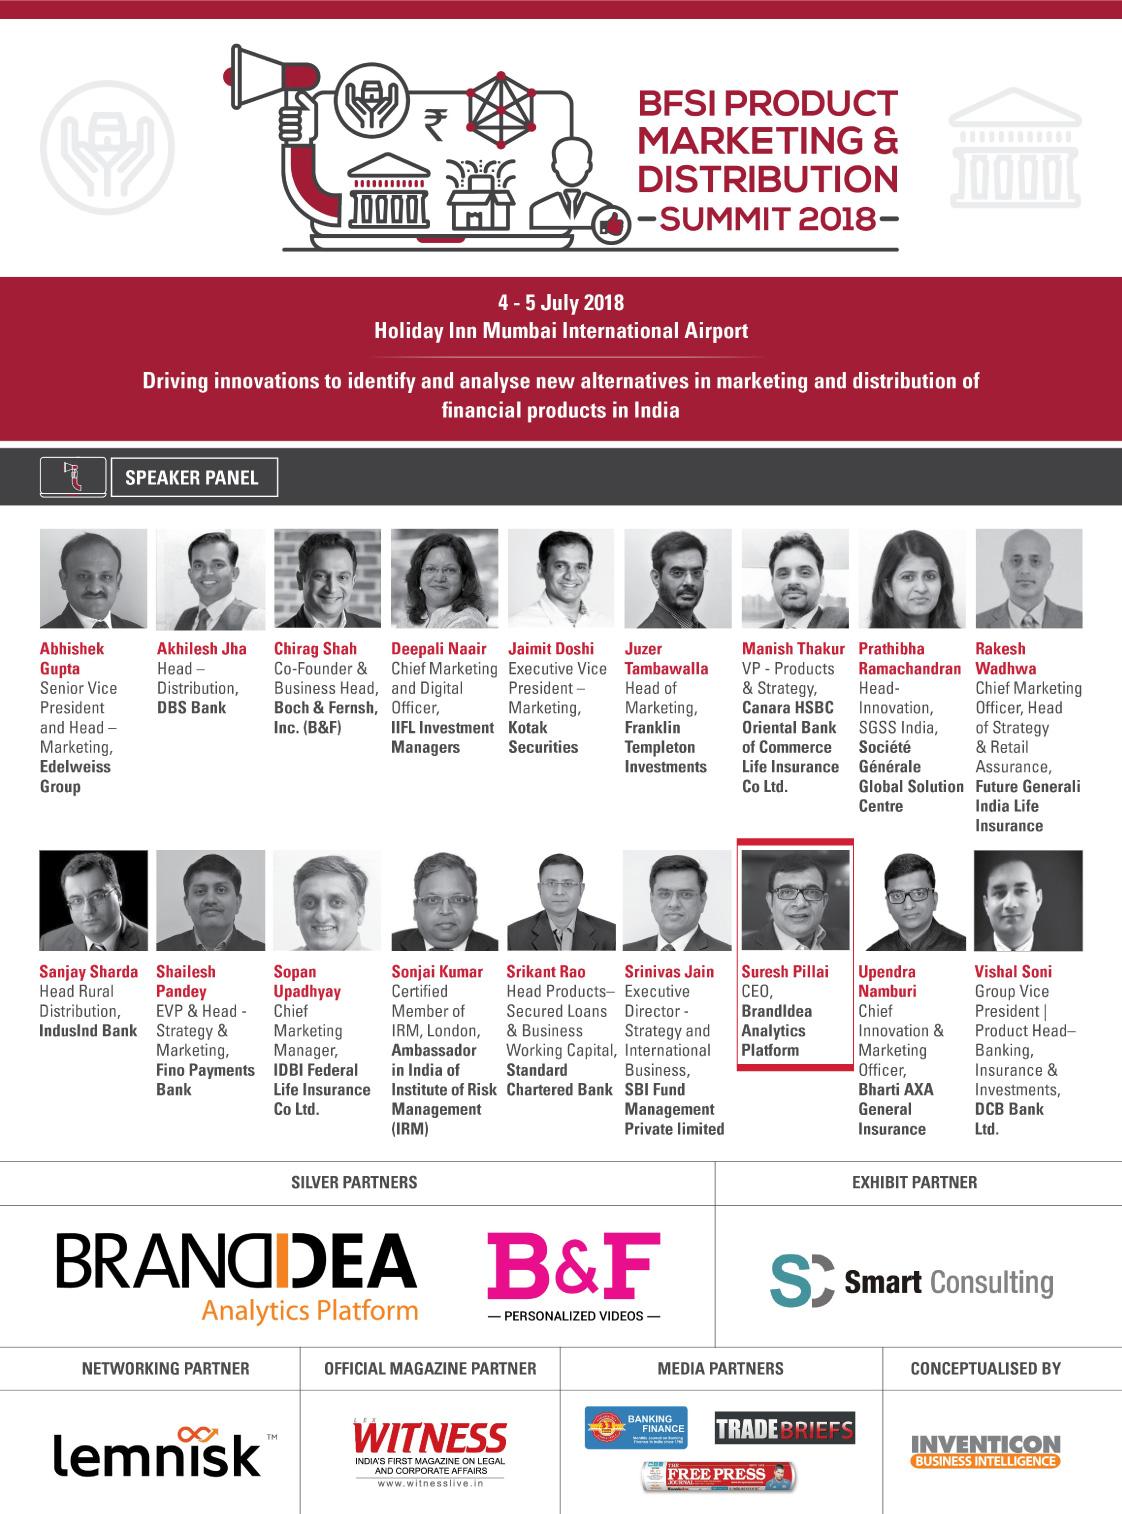 BFSI Marketing & Distribution Submit 2018